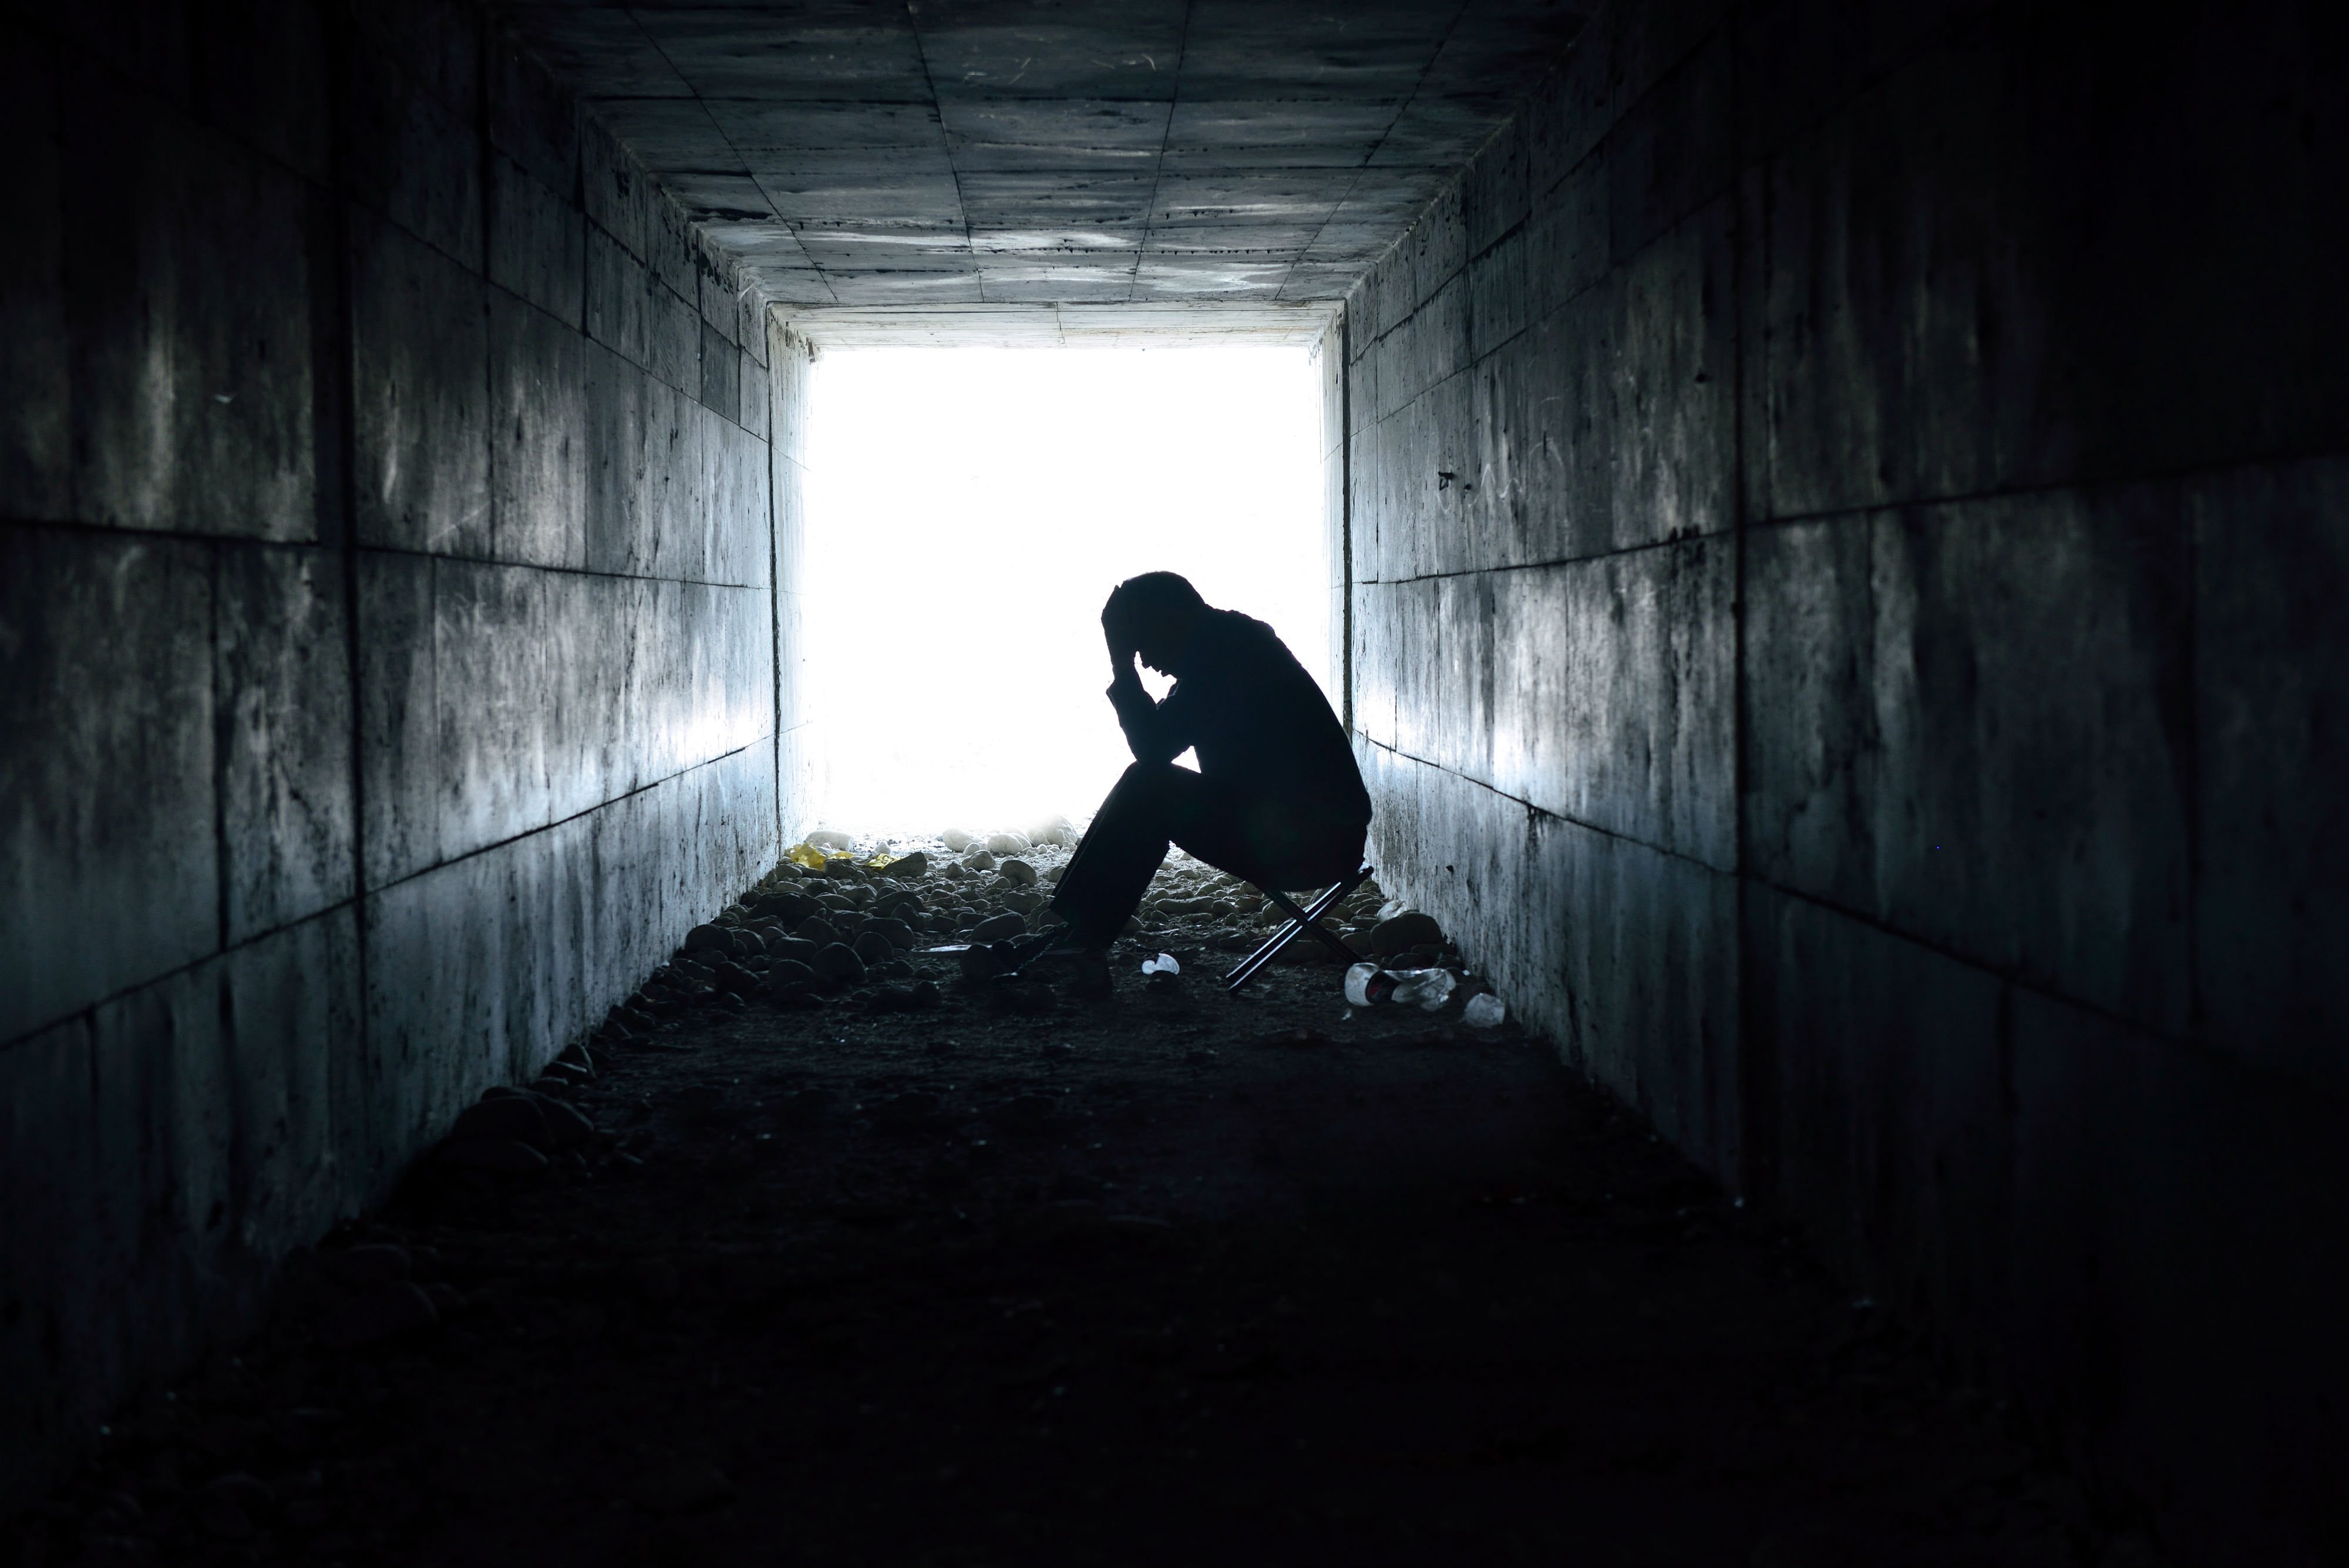 depression Sad Mood Sorrow Dark People Wallpapers HD 4000x2670